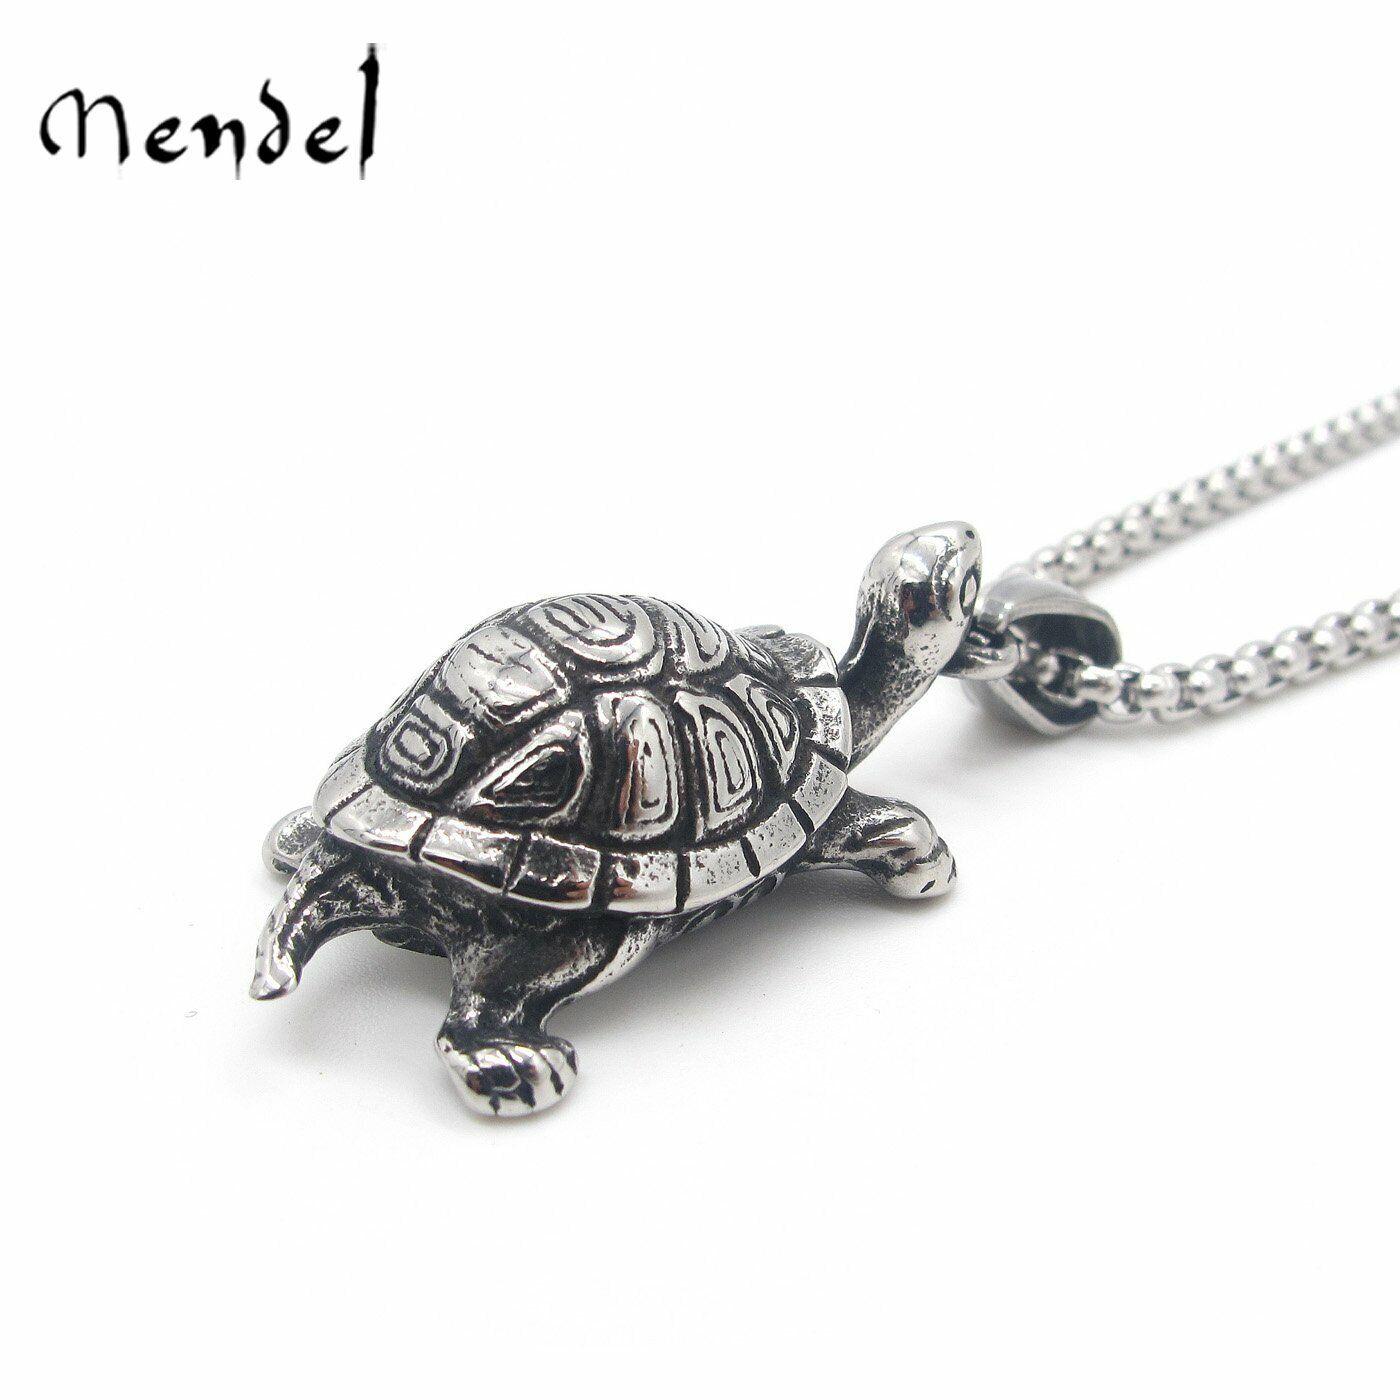 MENDEL Stainless Steel Mens Turtle Tortoise Pendant Necklace Jewelry Men Silver